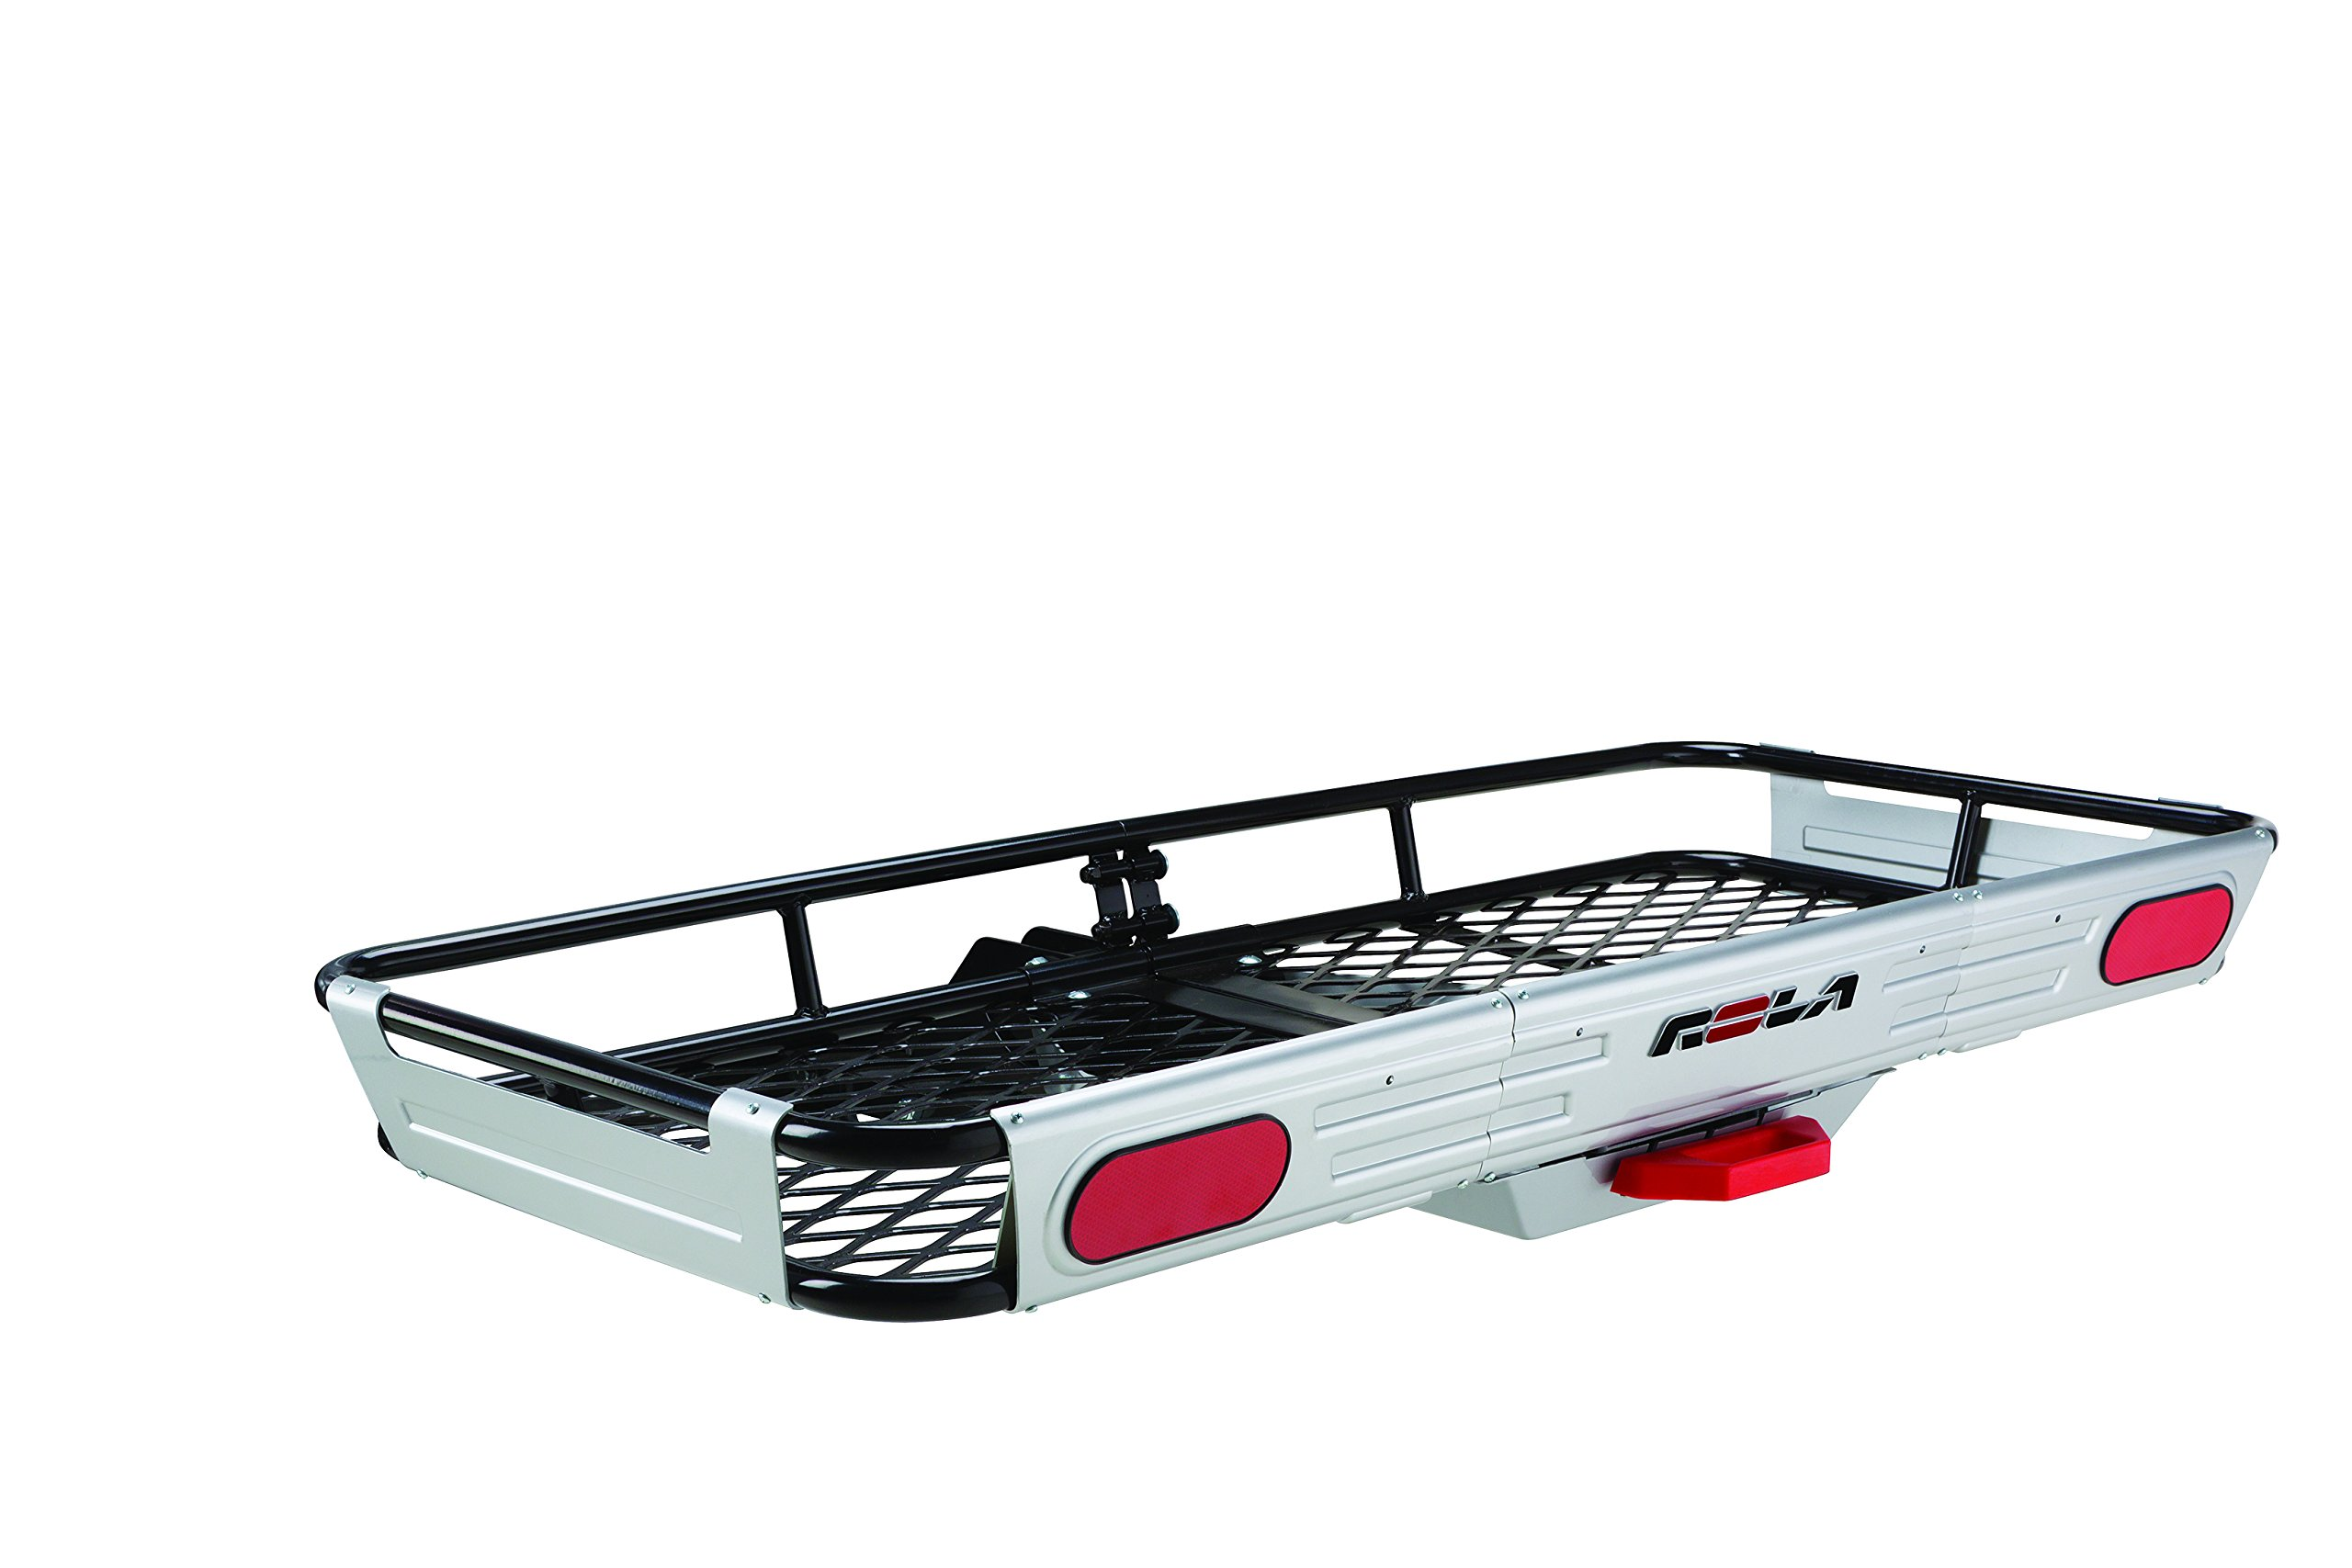 ROLA 59550 Dart Premium Folding Cargo Carrier by Rola